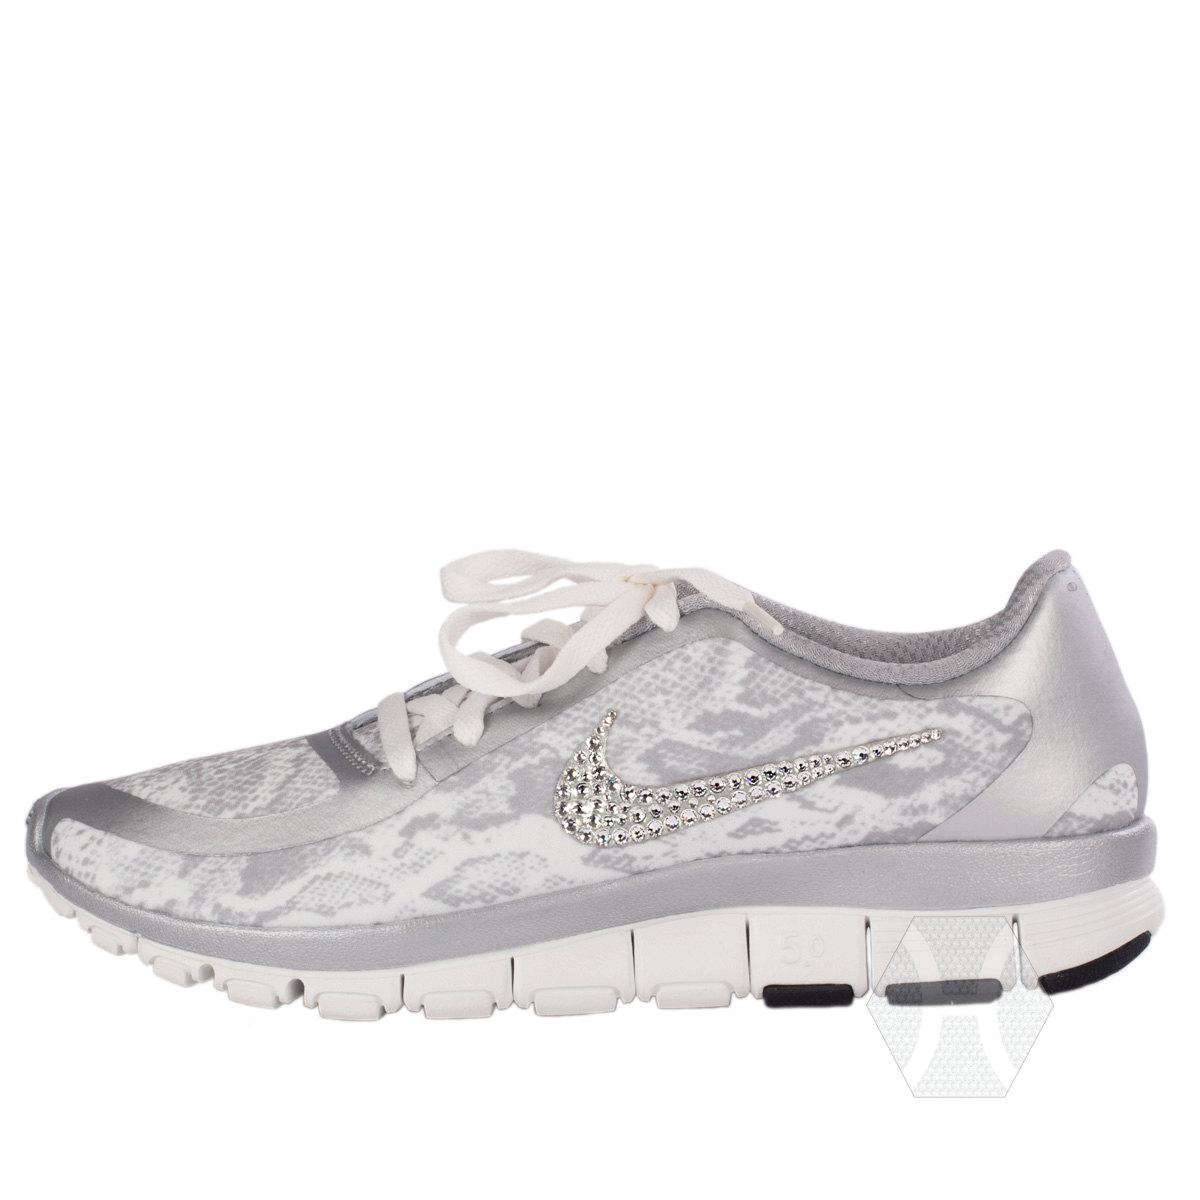 6233a88e6183c Women's Nike Free 5.0 v4 in White/Grey Snakeskin with Swarovski crystal  detail